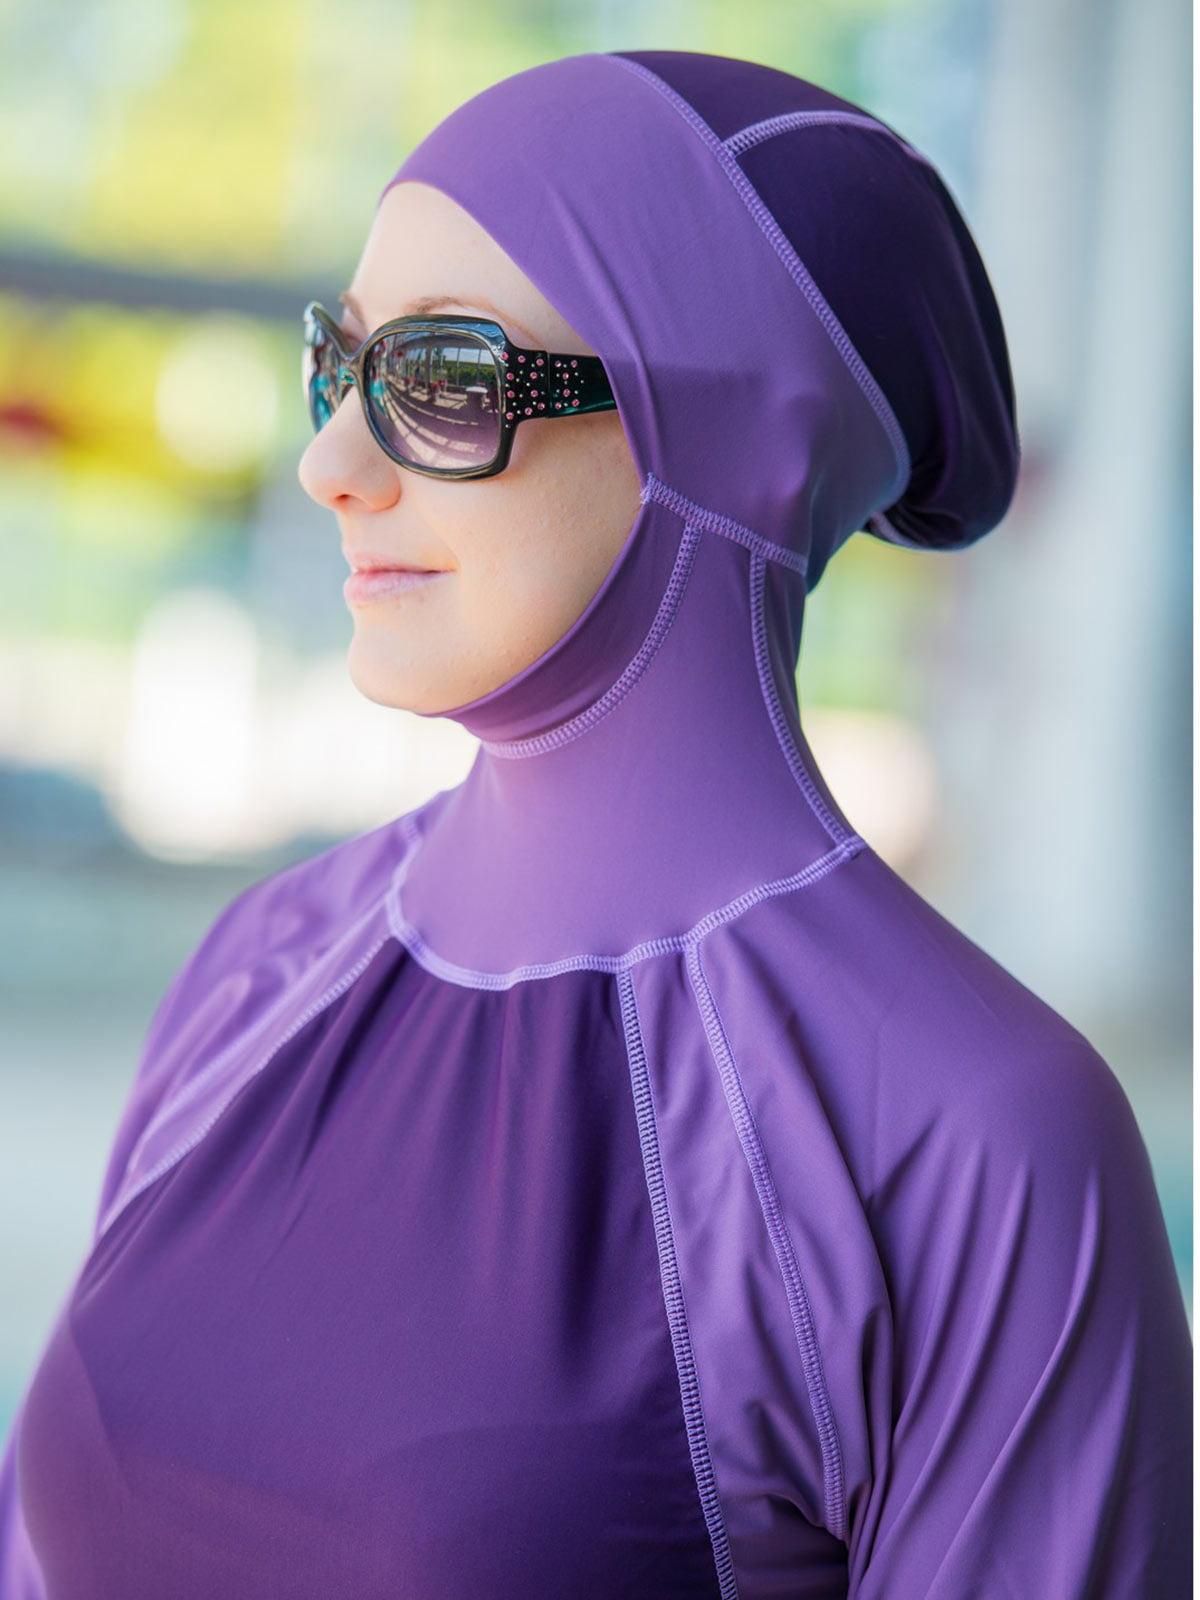 075fd2e30c Al-Sharifa Women s Full Coverage Modest Swimsuit Hijab Hooded Islamic  Swimwear - Walmart.com